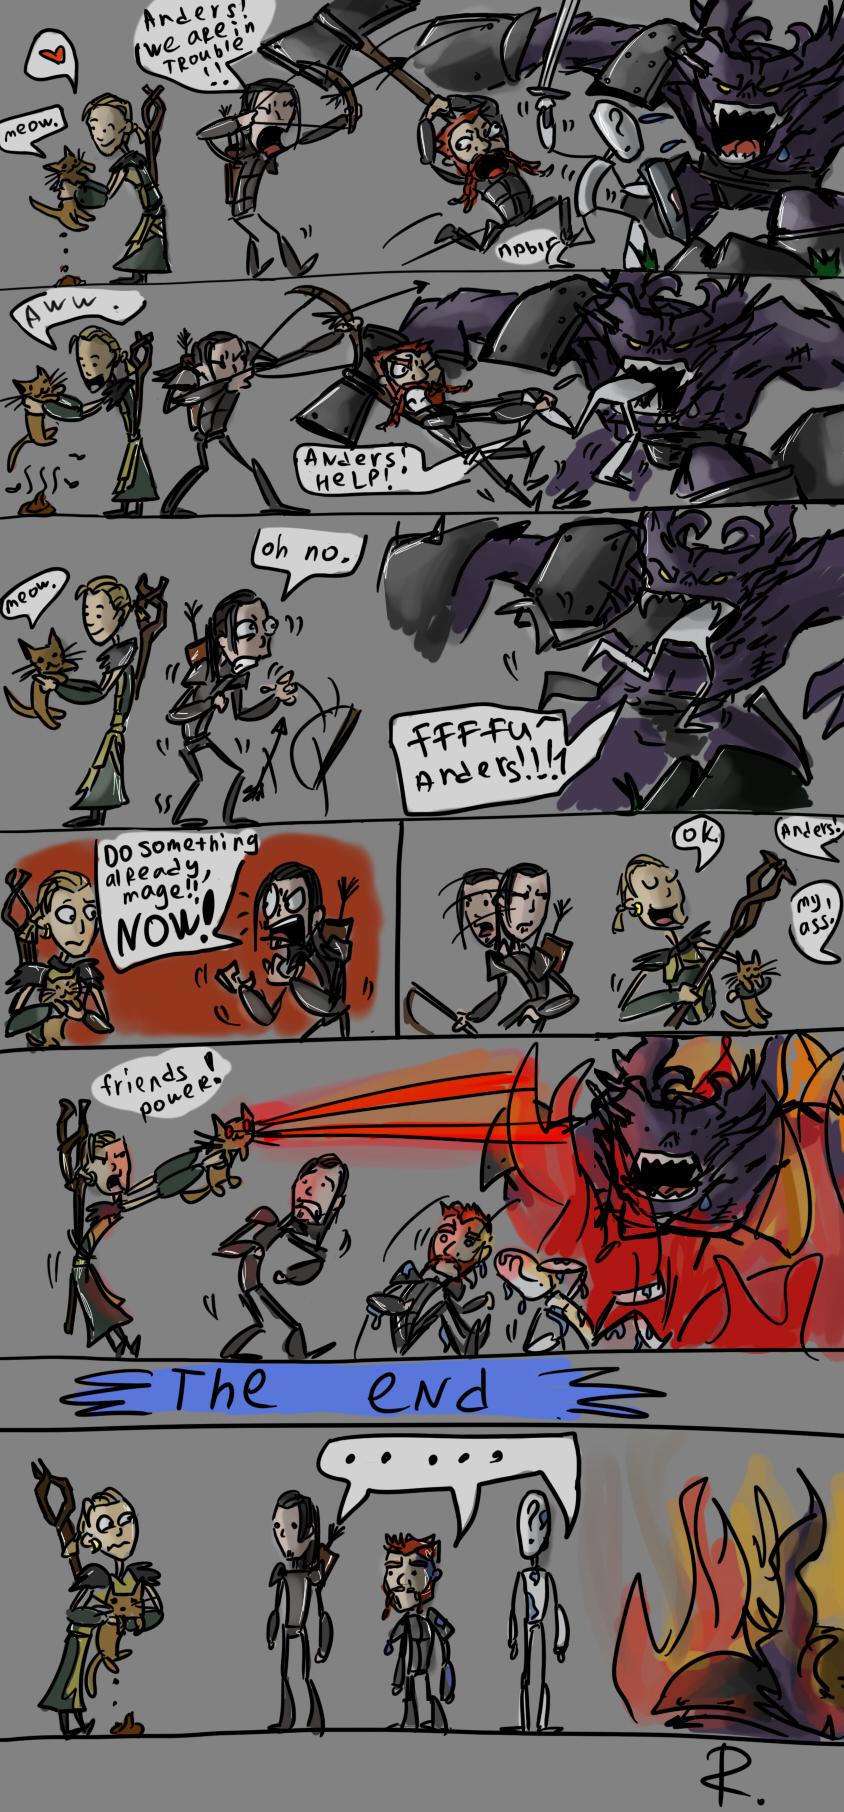 Dragon_Age_Origins_Awakening_by_Ayej.jpg